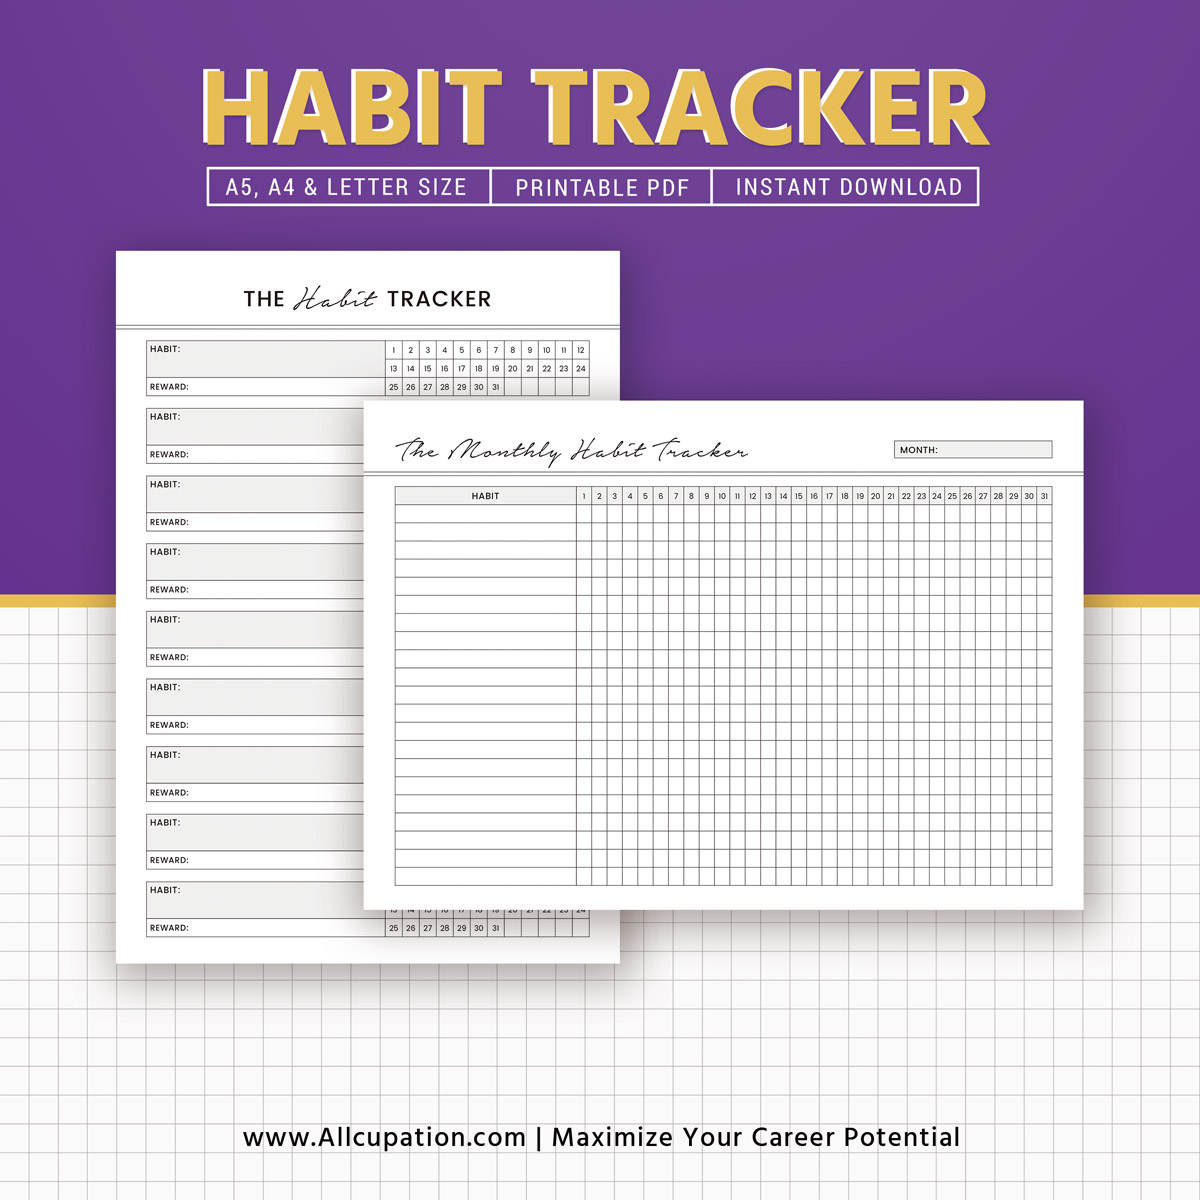 Printable Habit Tracker Monthly Habit Tracker Inserts Habit Planner Planner Design Best